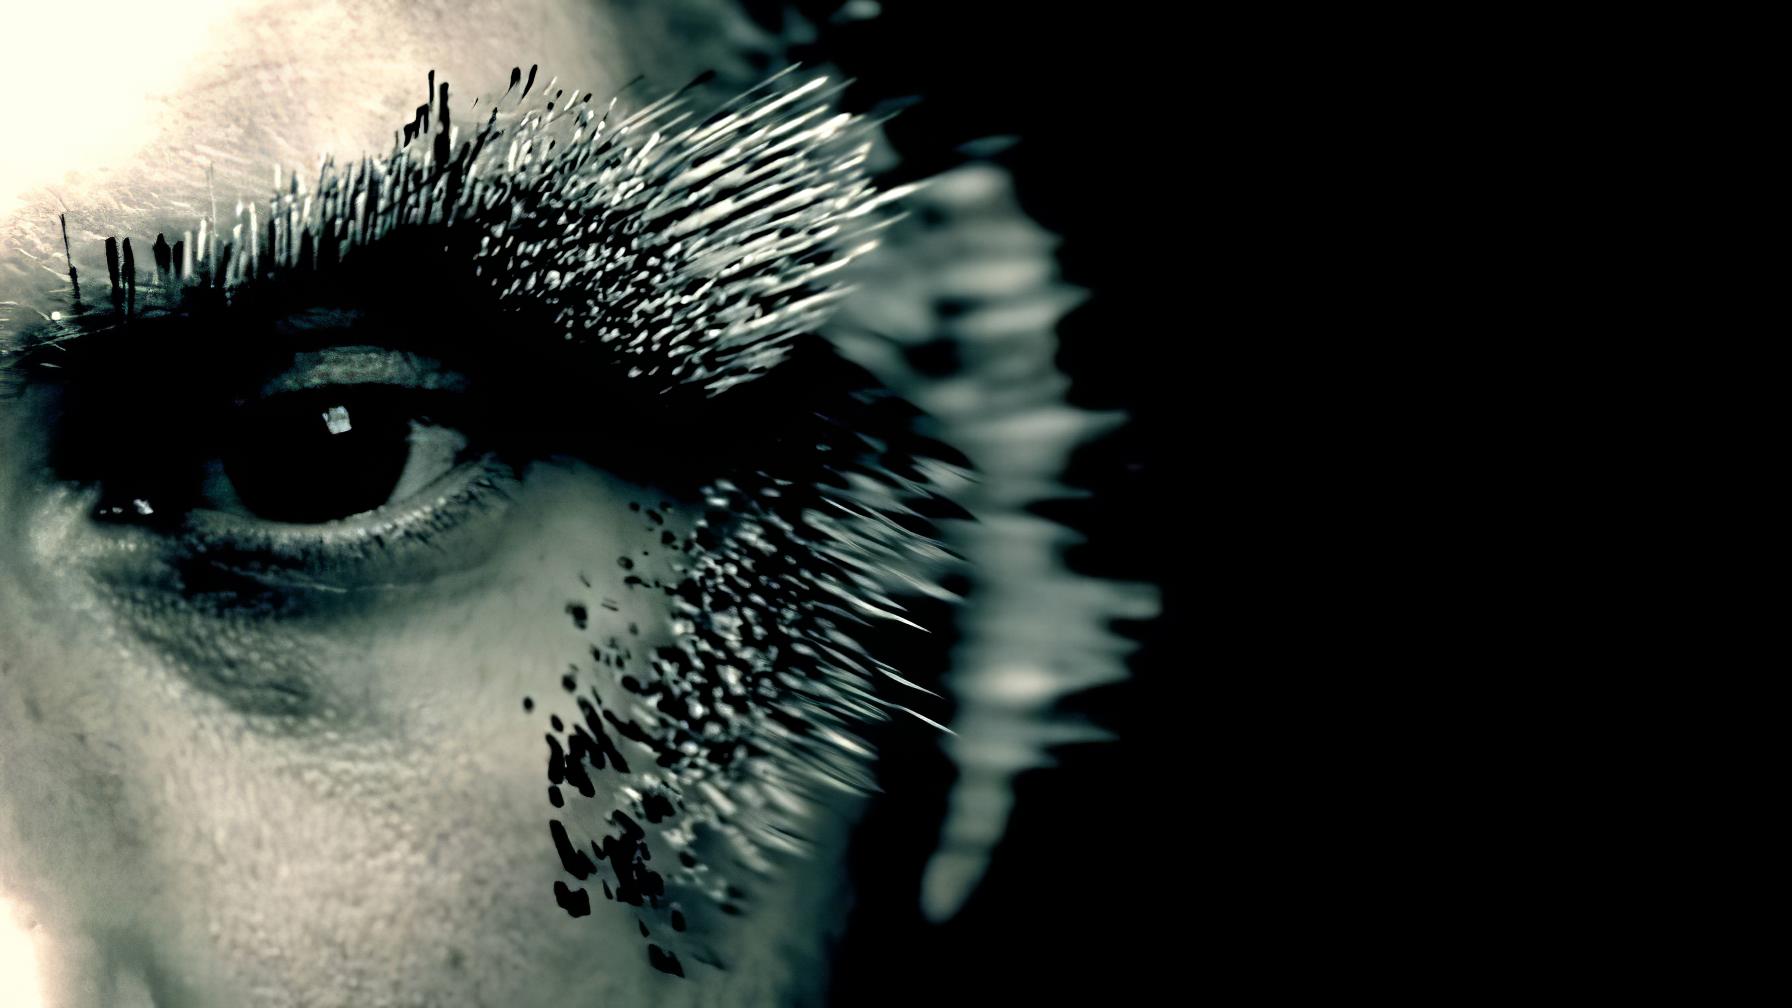 immersive-ltd_Knife-Party_live_music-videos_04-896×504-Gigapixel